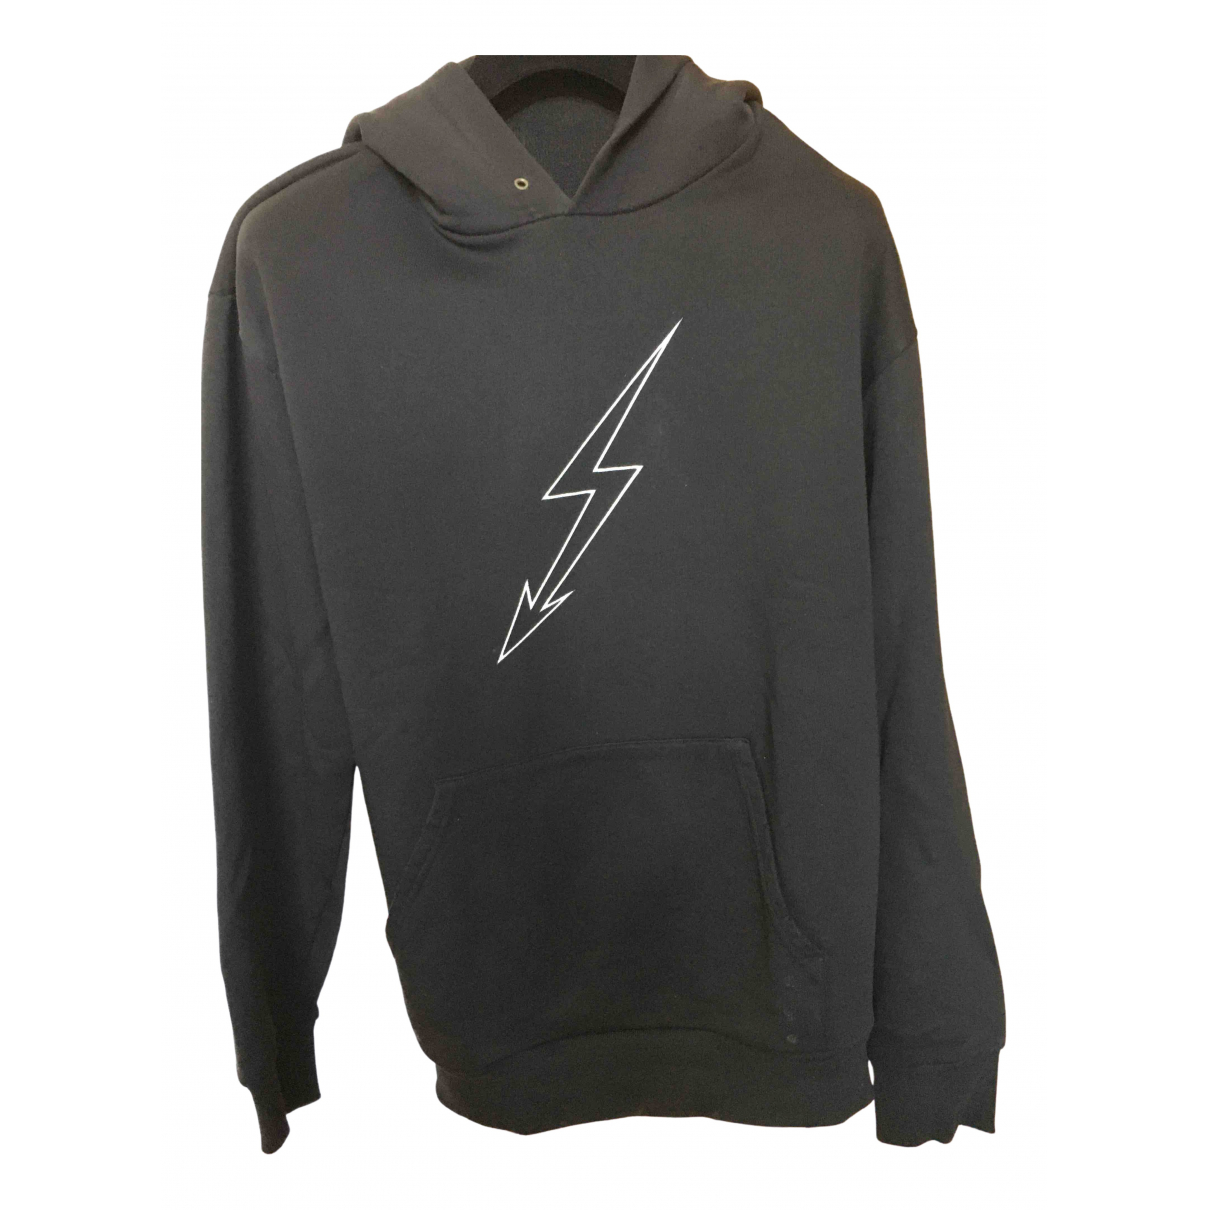 Givenchy \N Black Cotton Knitwear & Sweatshirts for Men M International